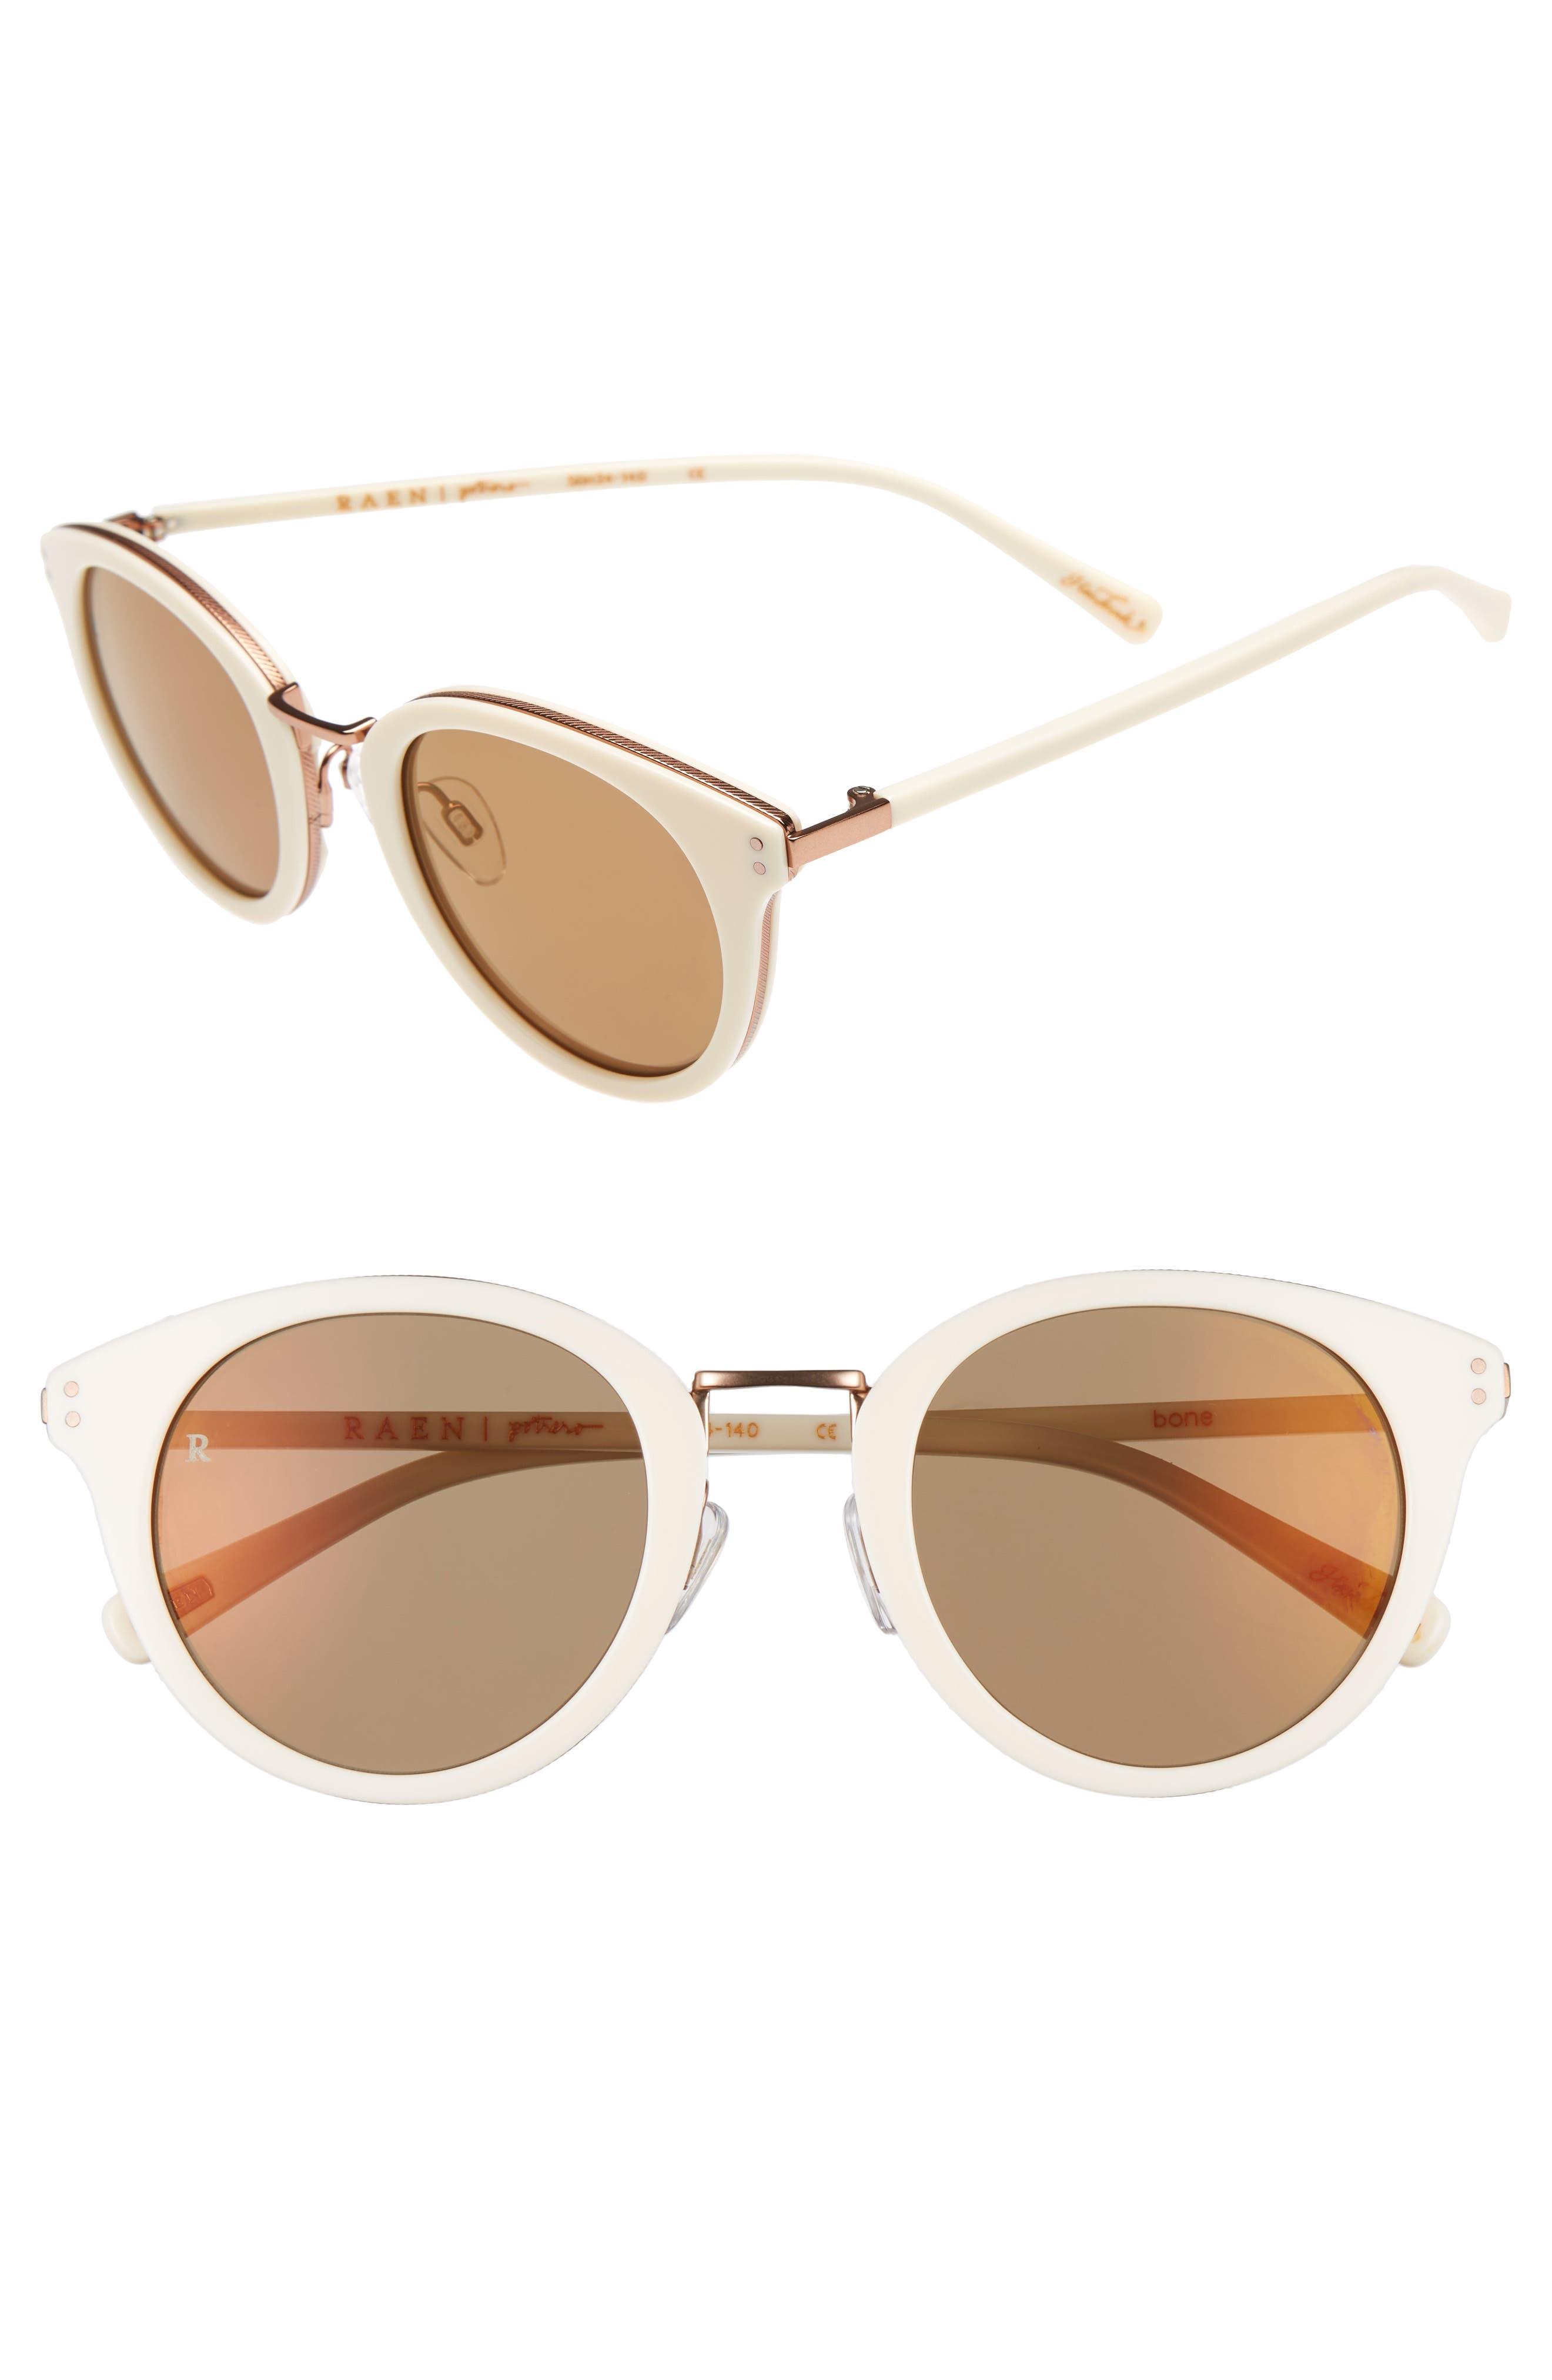 Portrero 50mm Sunglasses,                             Main thumbnail 1, color,                             100